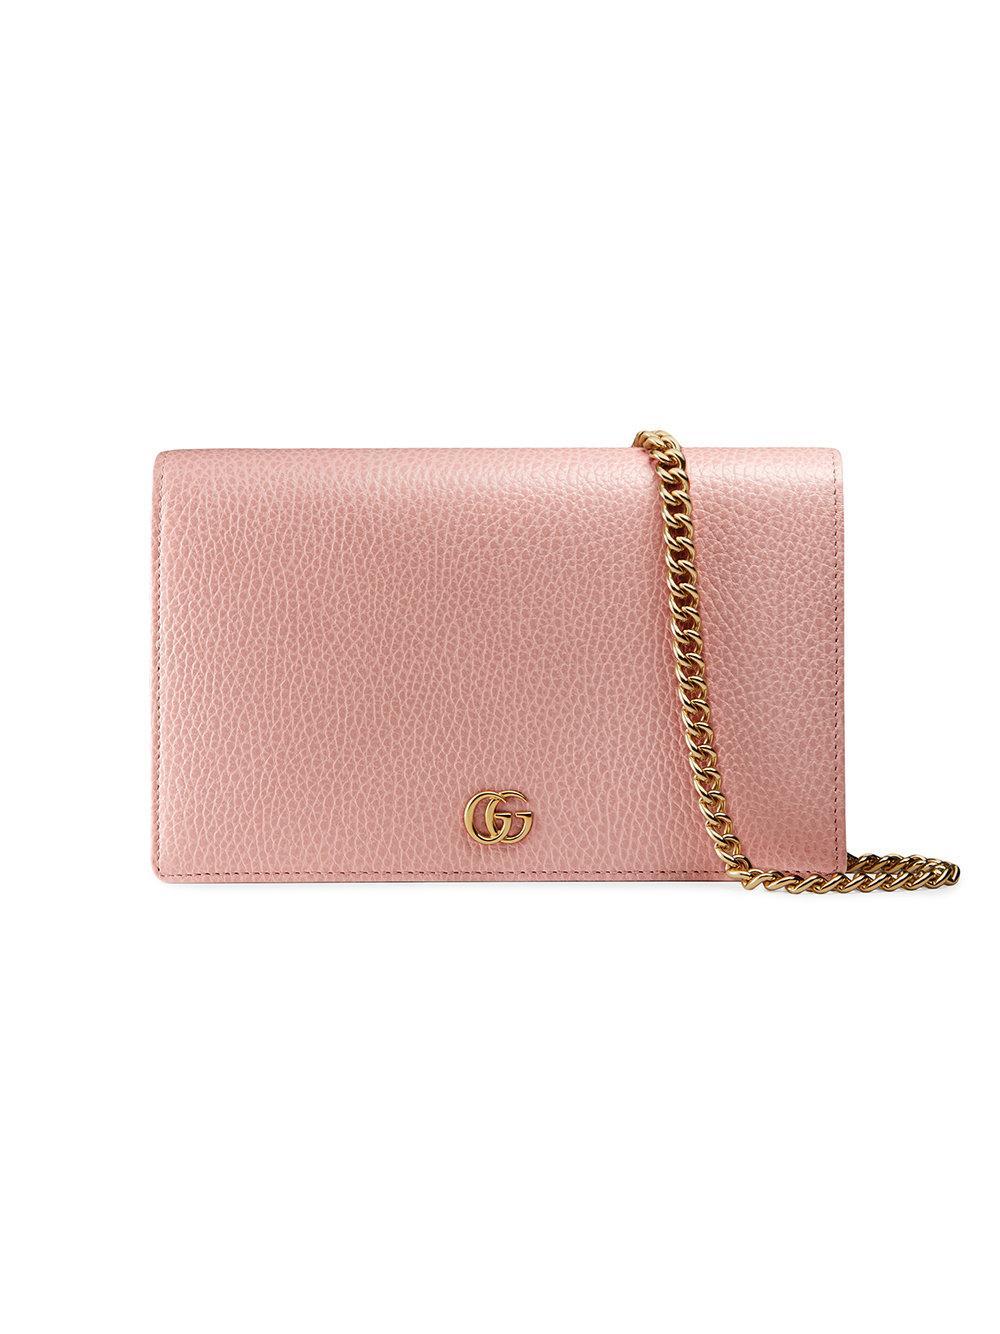 061ba23d0a0e Gucci Gg Marmont Leather Mini Chain Bag - Pink | ModeSens